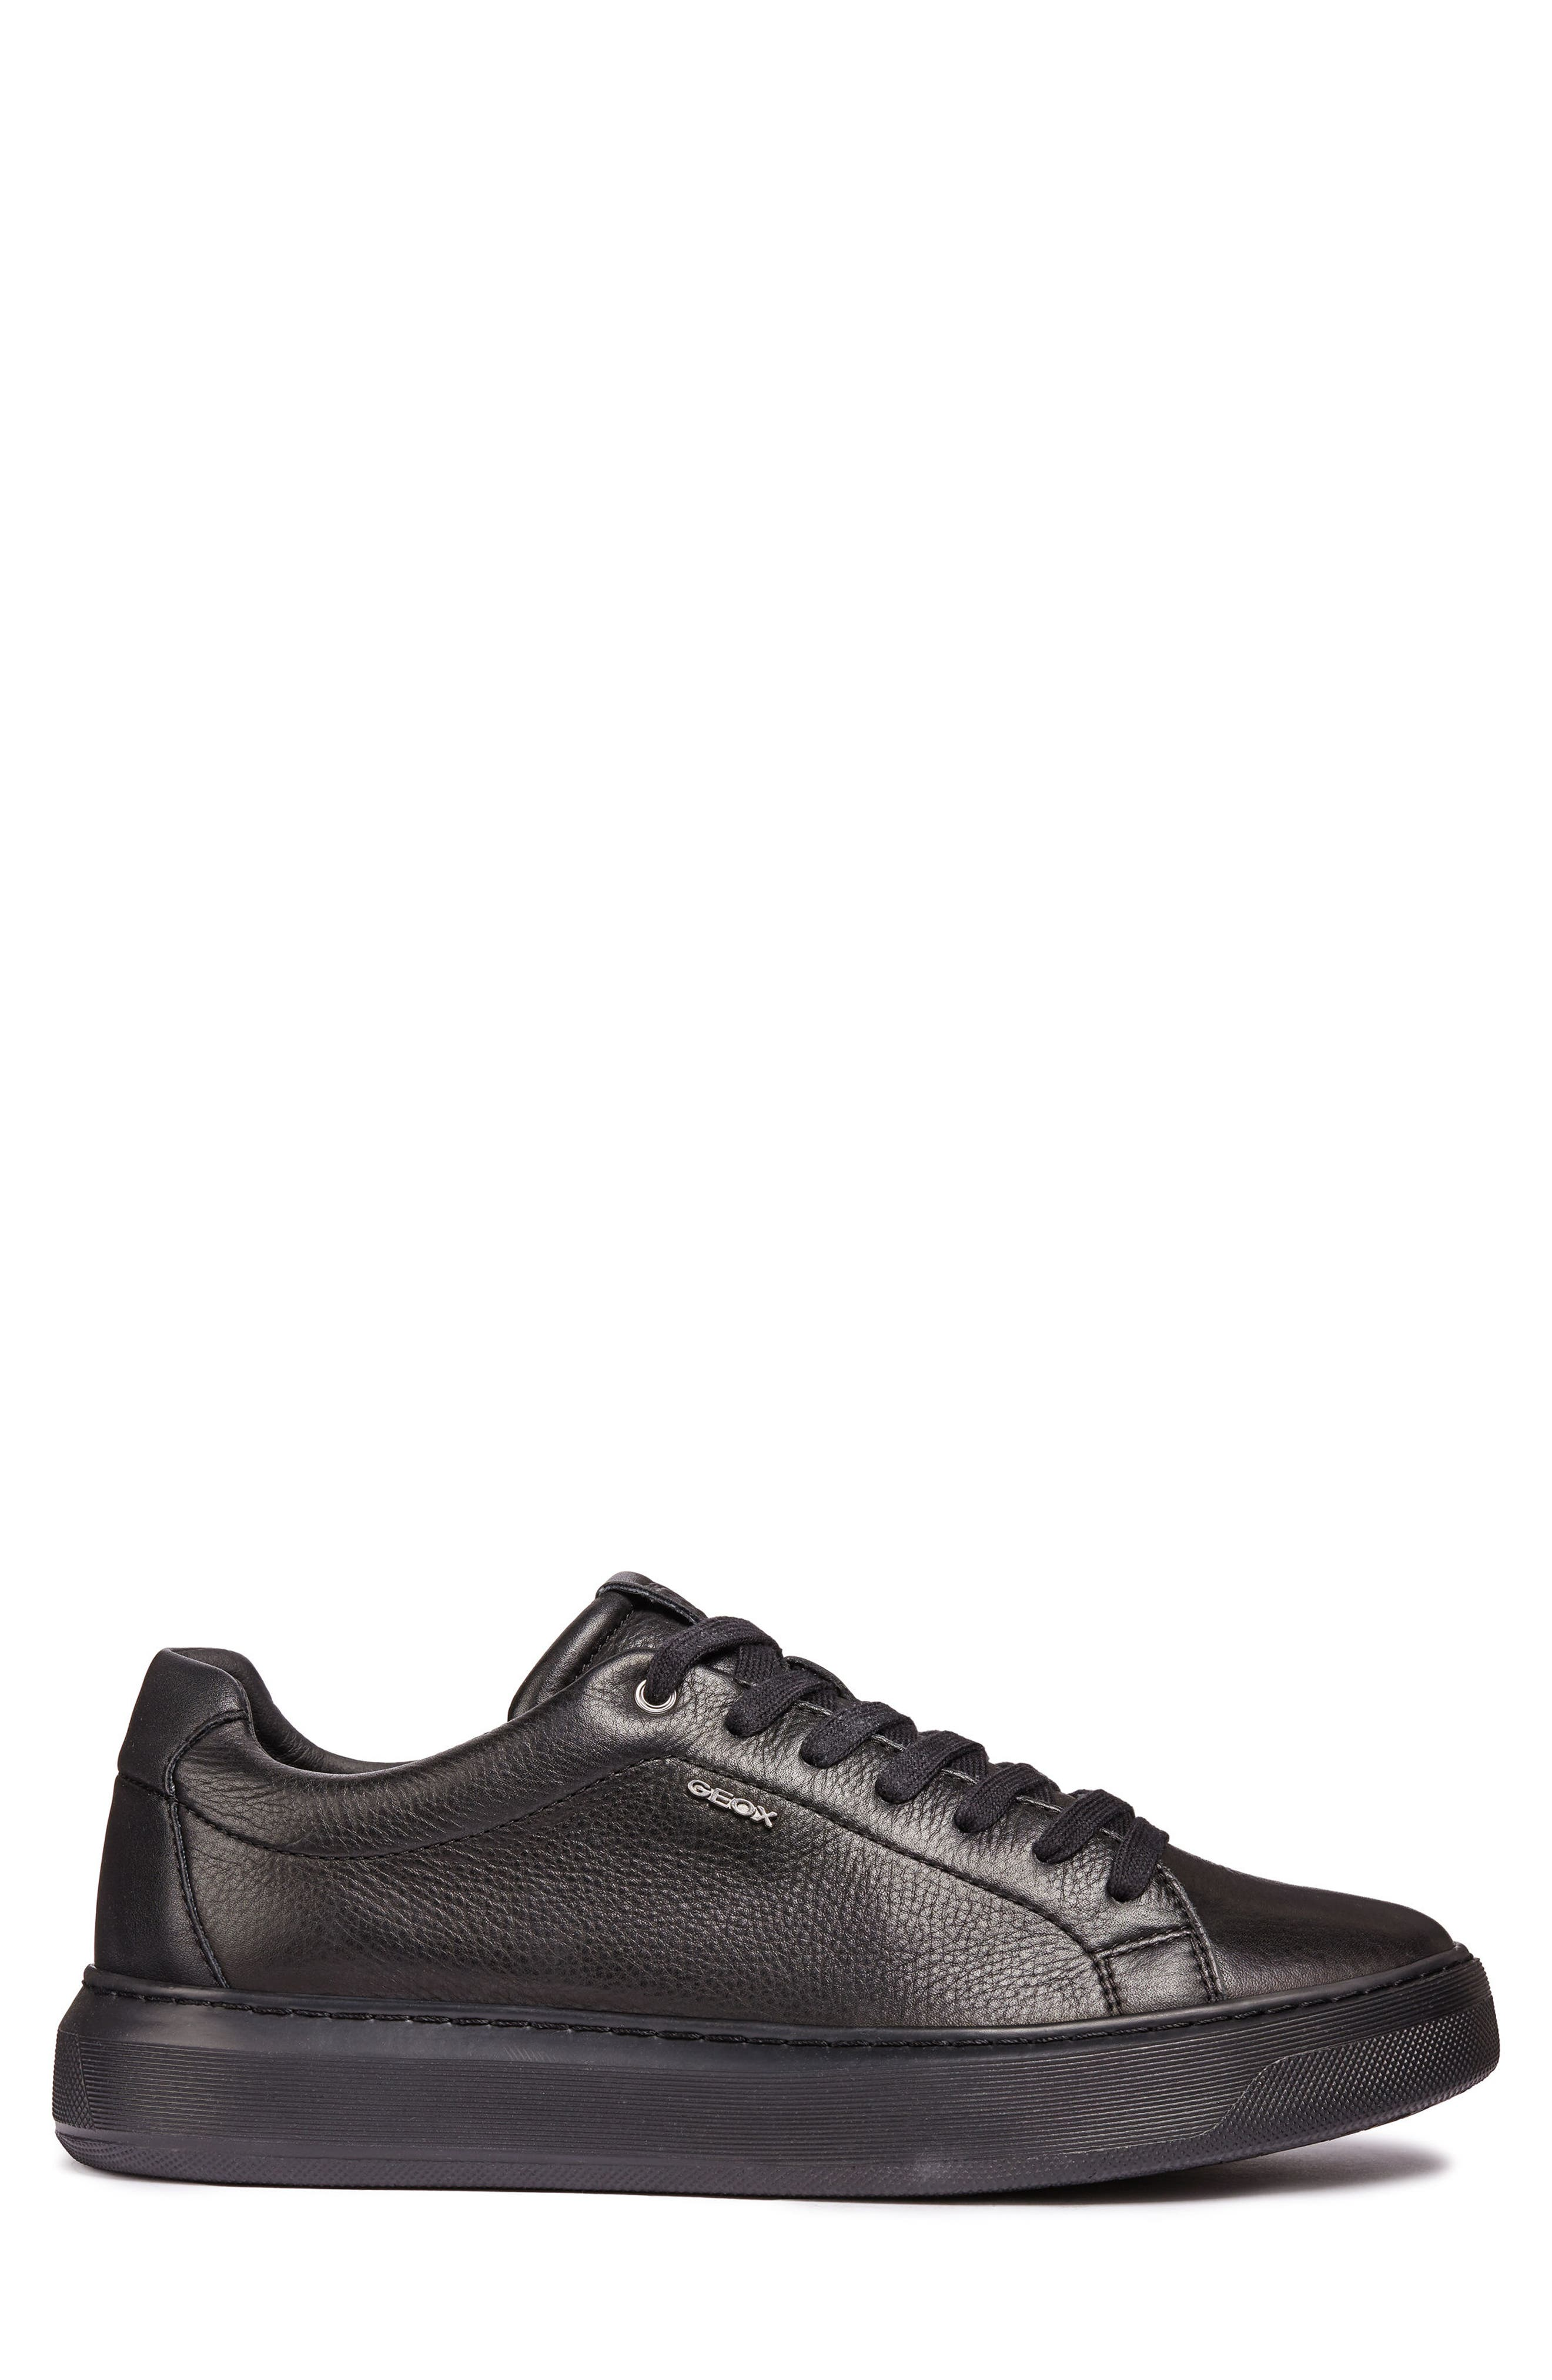 Deiven 4 Low Top Sneaker,                             Alternate thumbnail 3, color,                             BLACK LEATHER